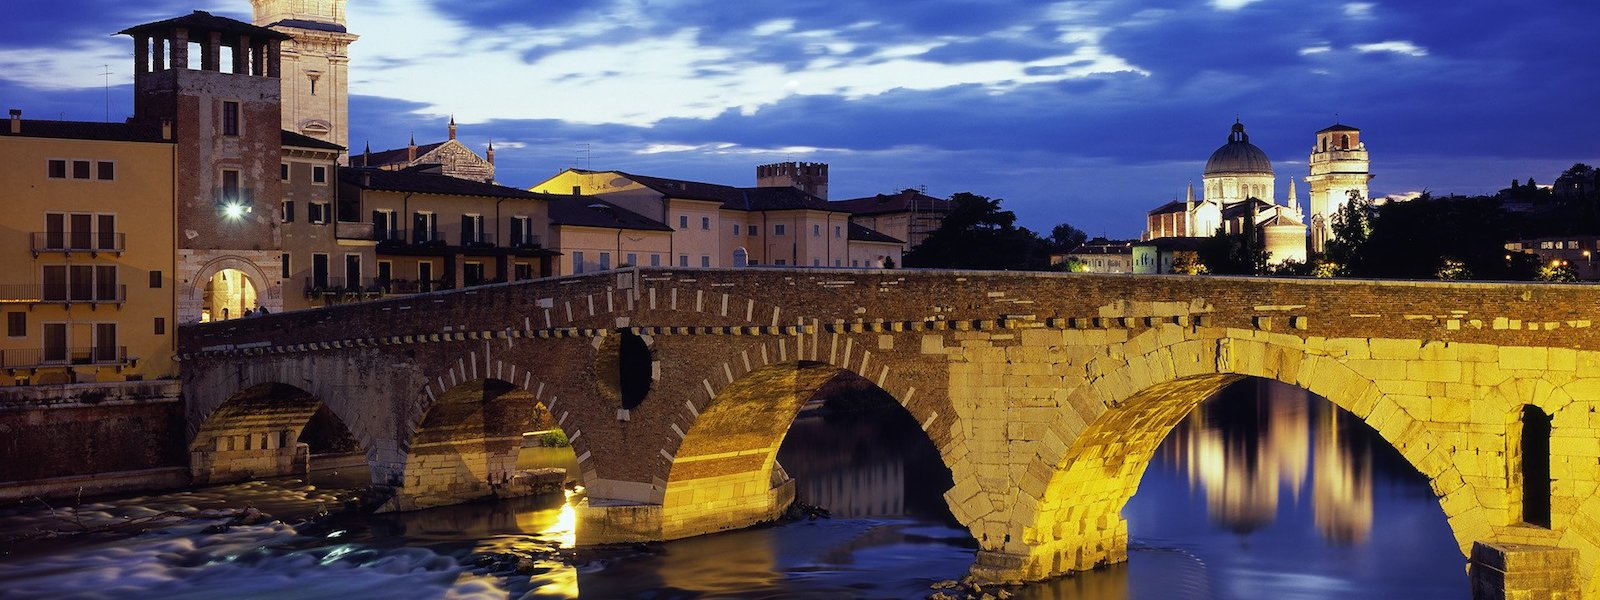 ponte-pietra-verona